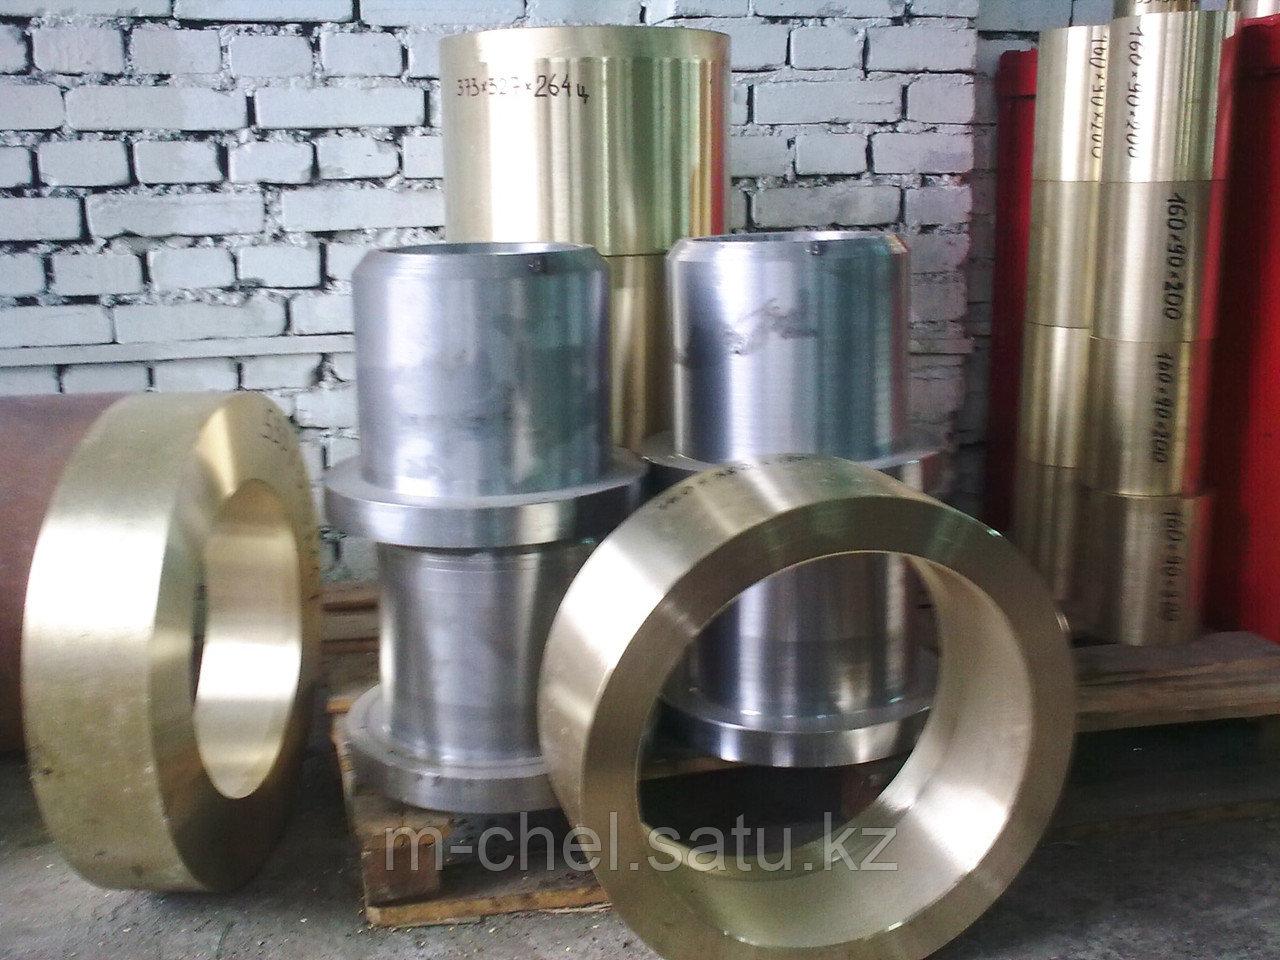 Втулка бронзовая 132 мм броцс5-5-5 центробежное литье ГОСТ